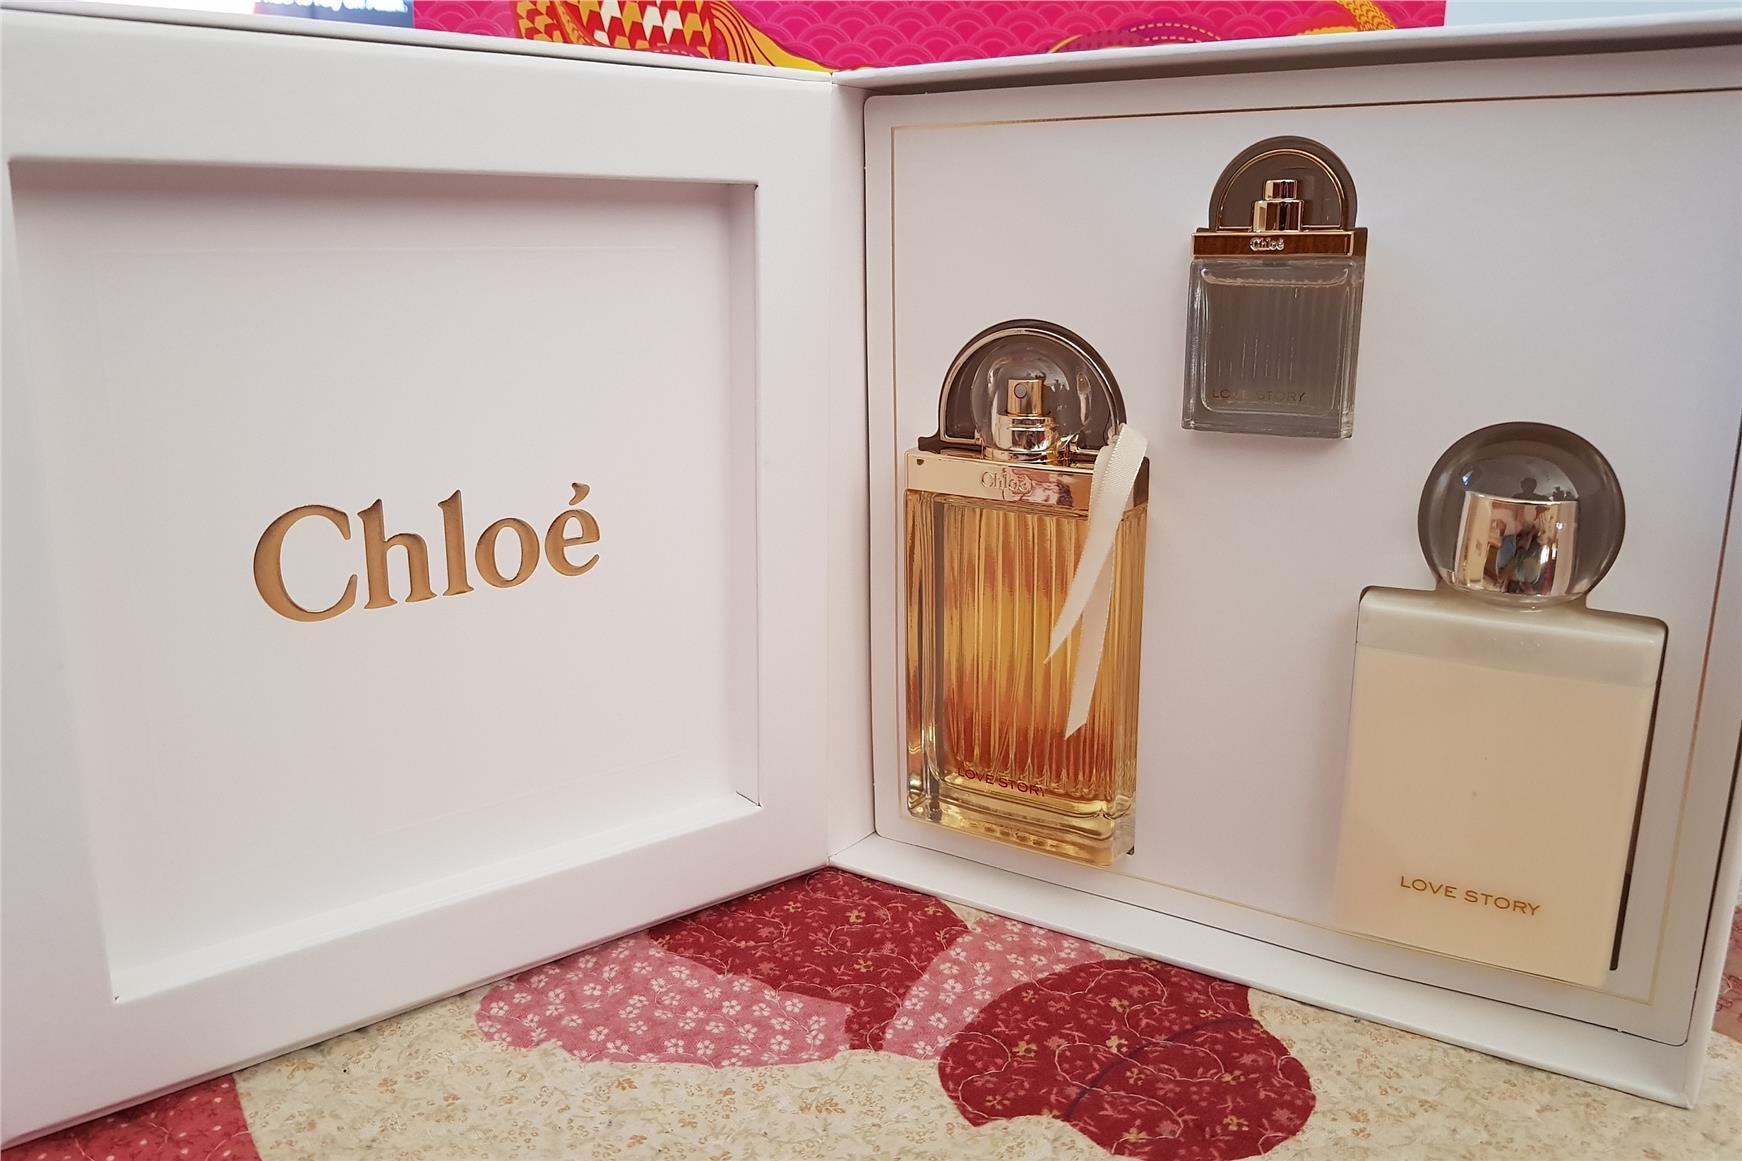 Original Chloe Love Story By Chloe E End 282020 1115 Pm